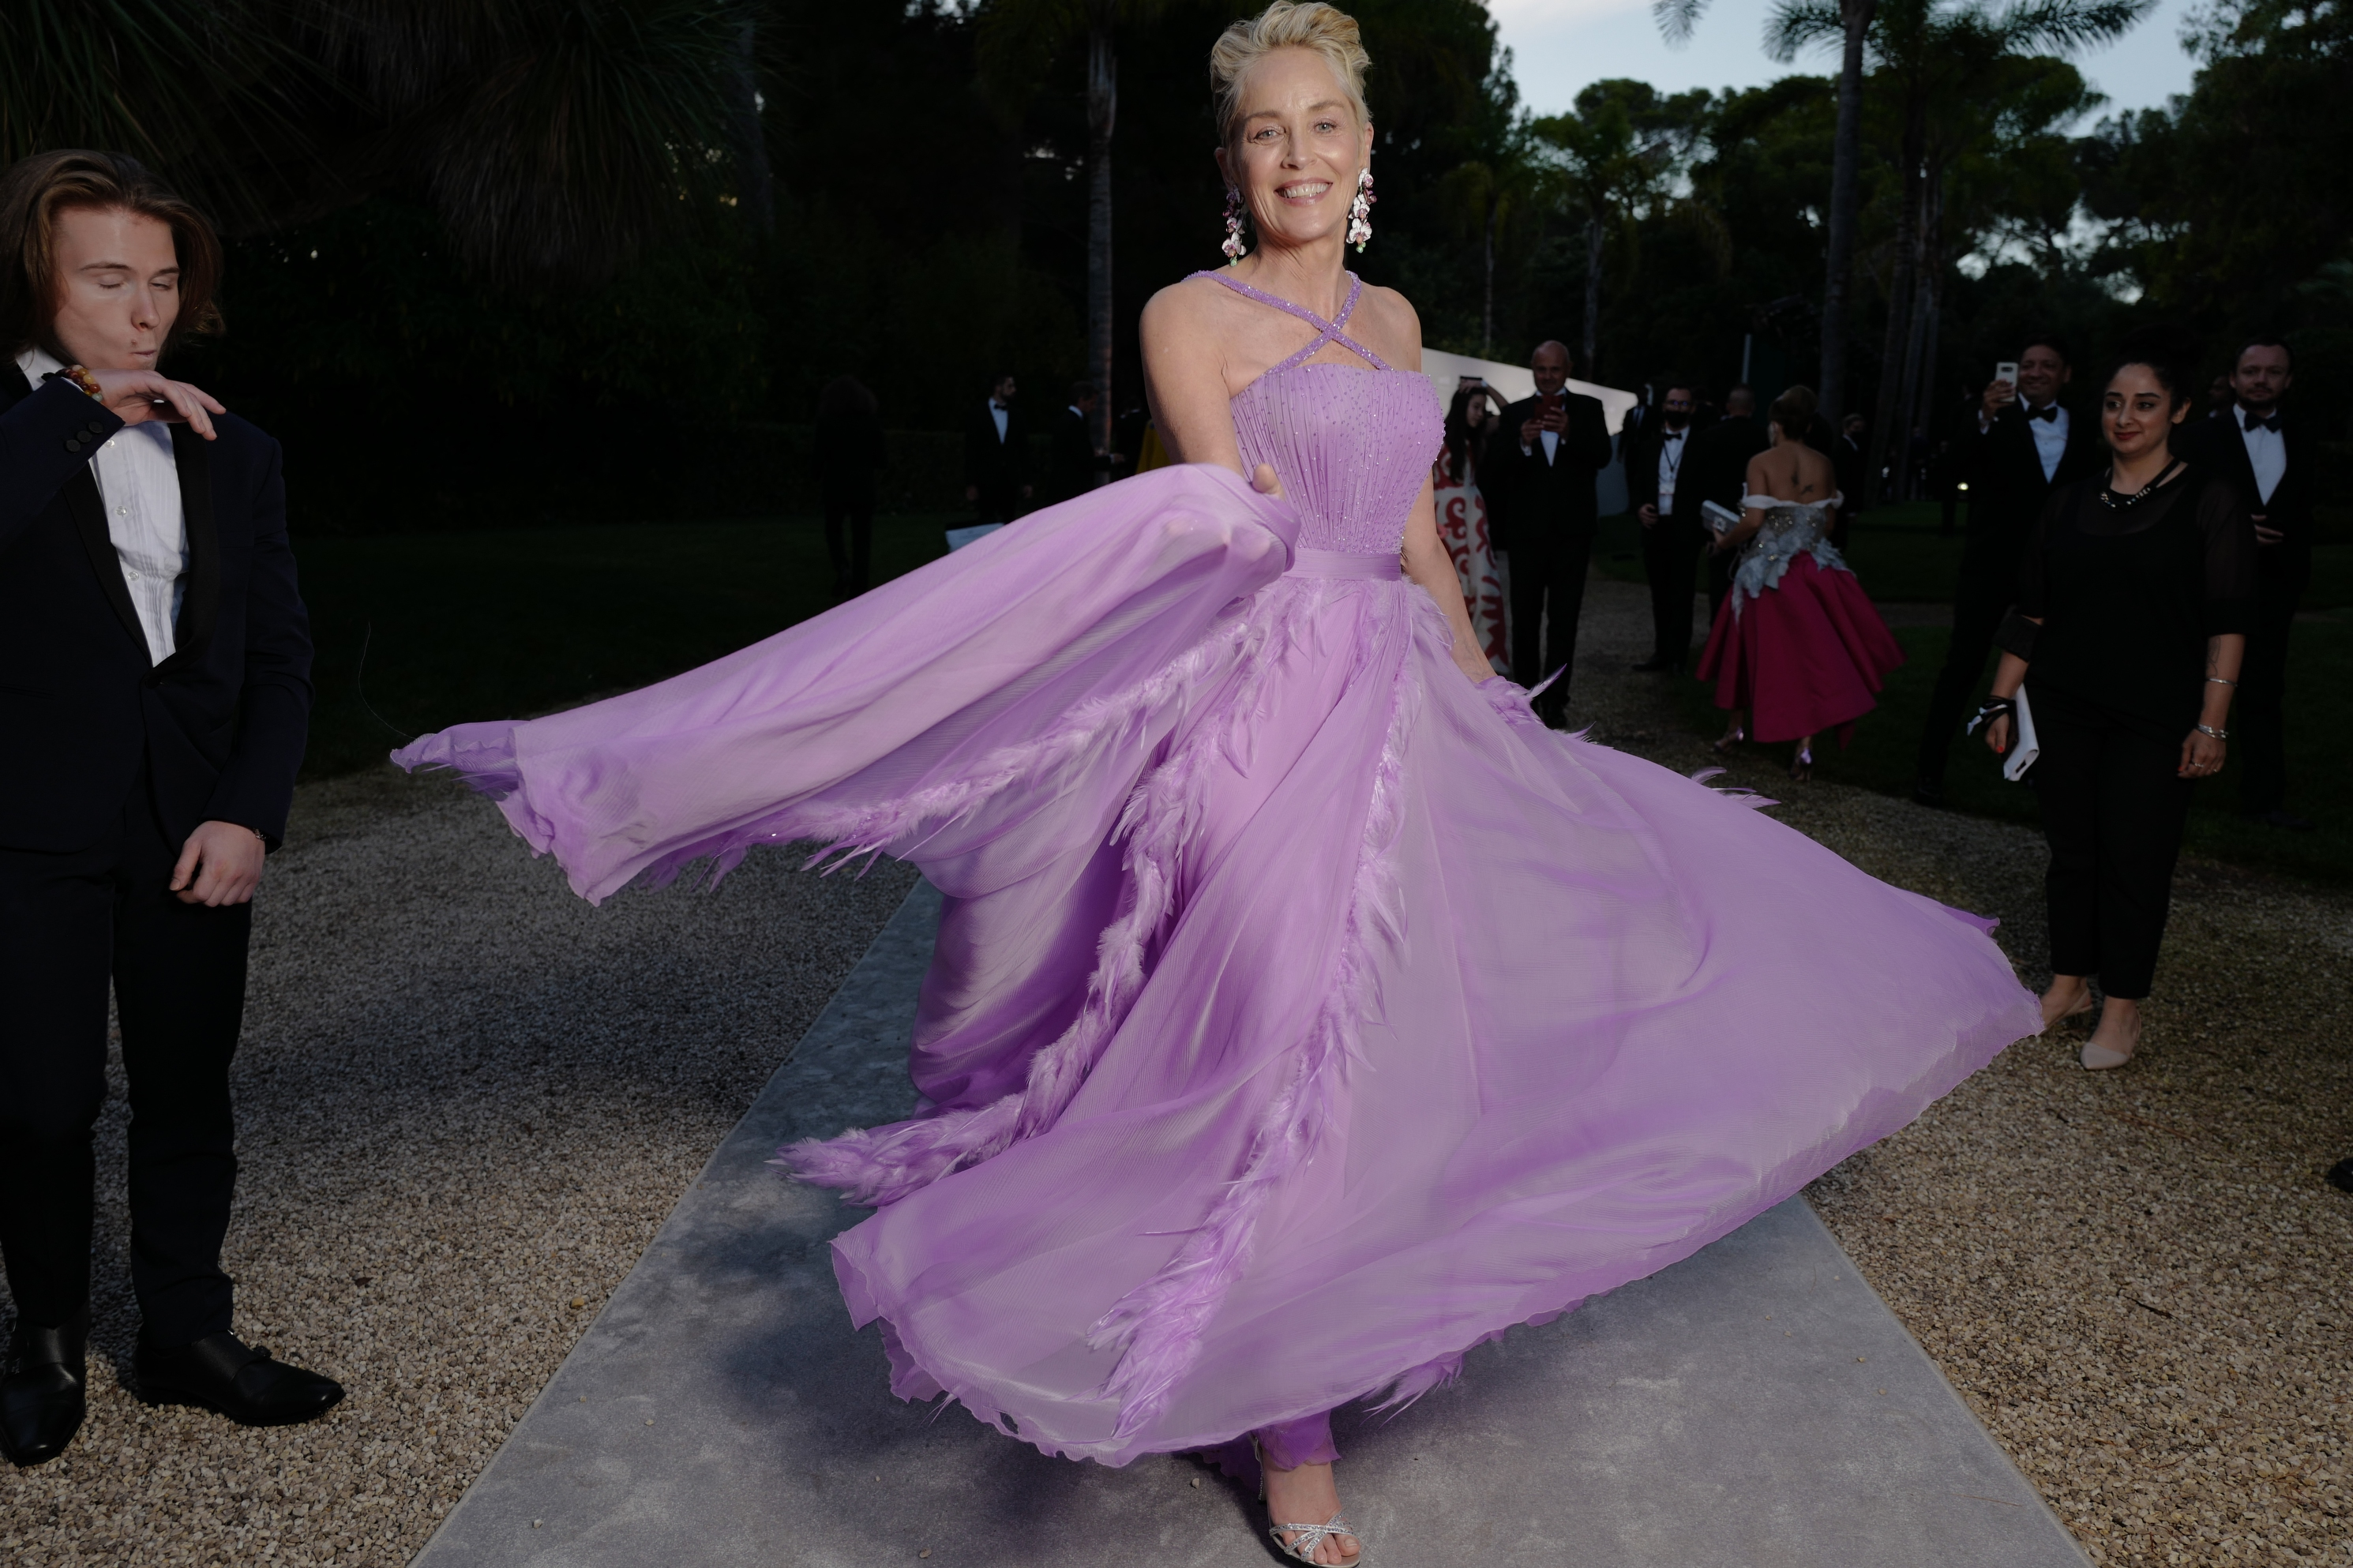 Sharon Stone makes a dramatic entrance at the amfAR gala.